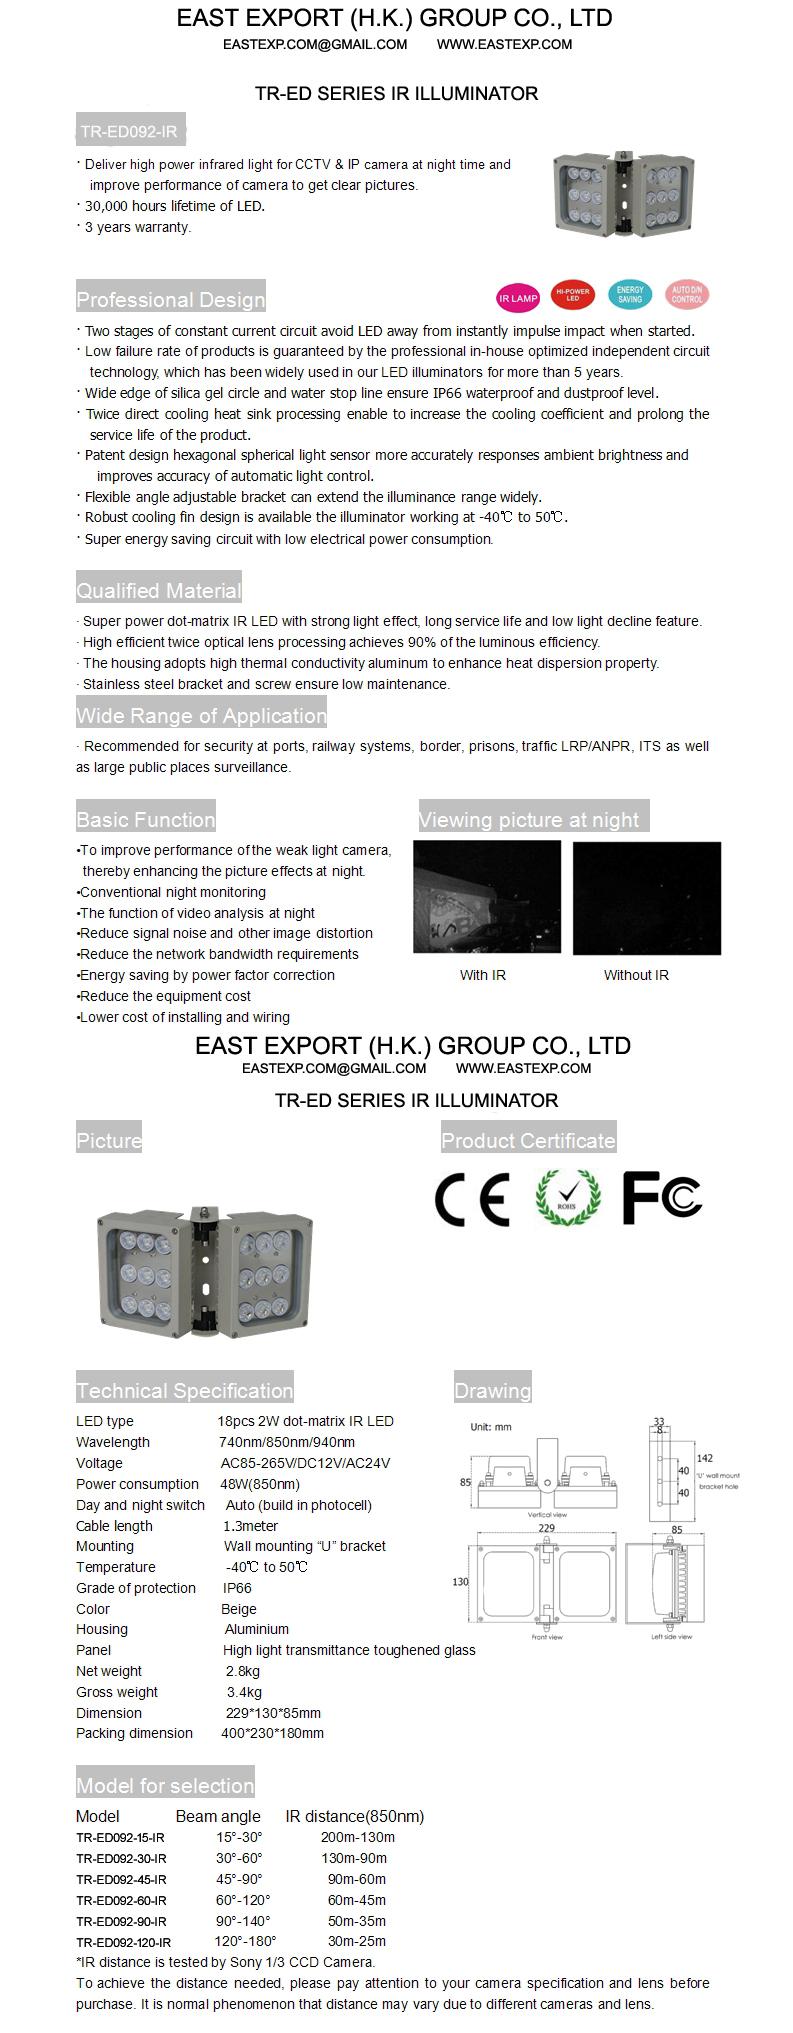 TR-ED092-IR IR Illuminator